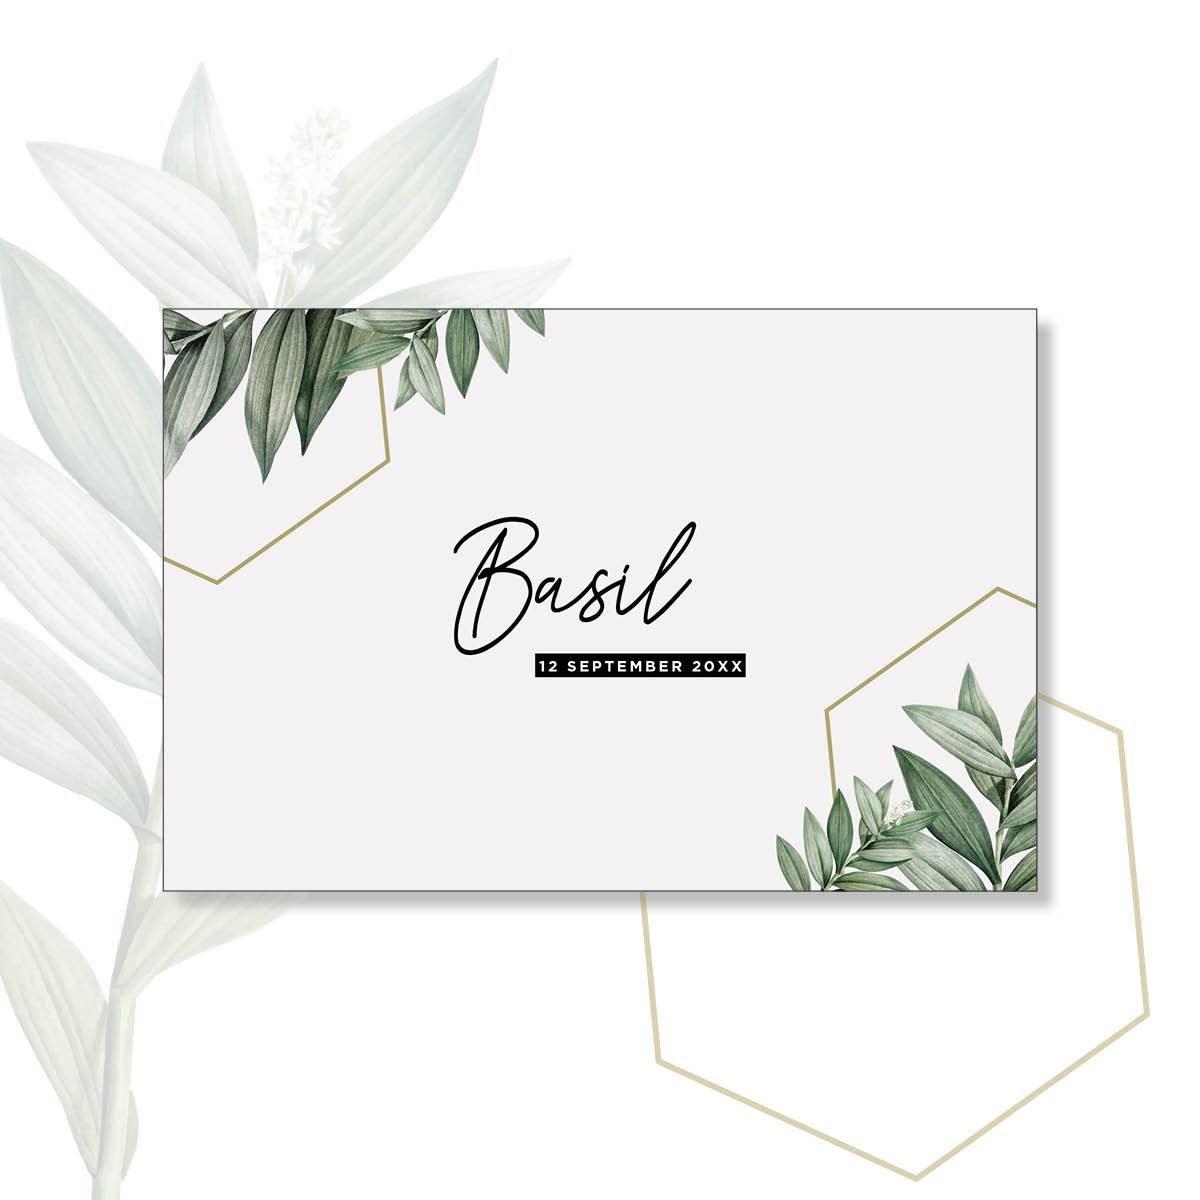 web basil steffi 10×15 enkel